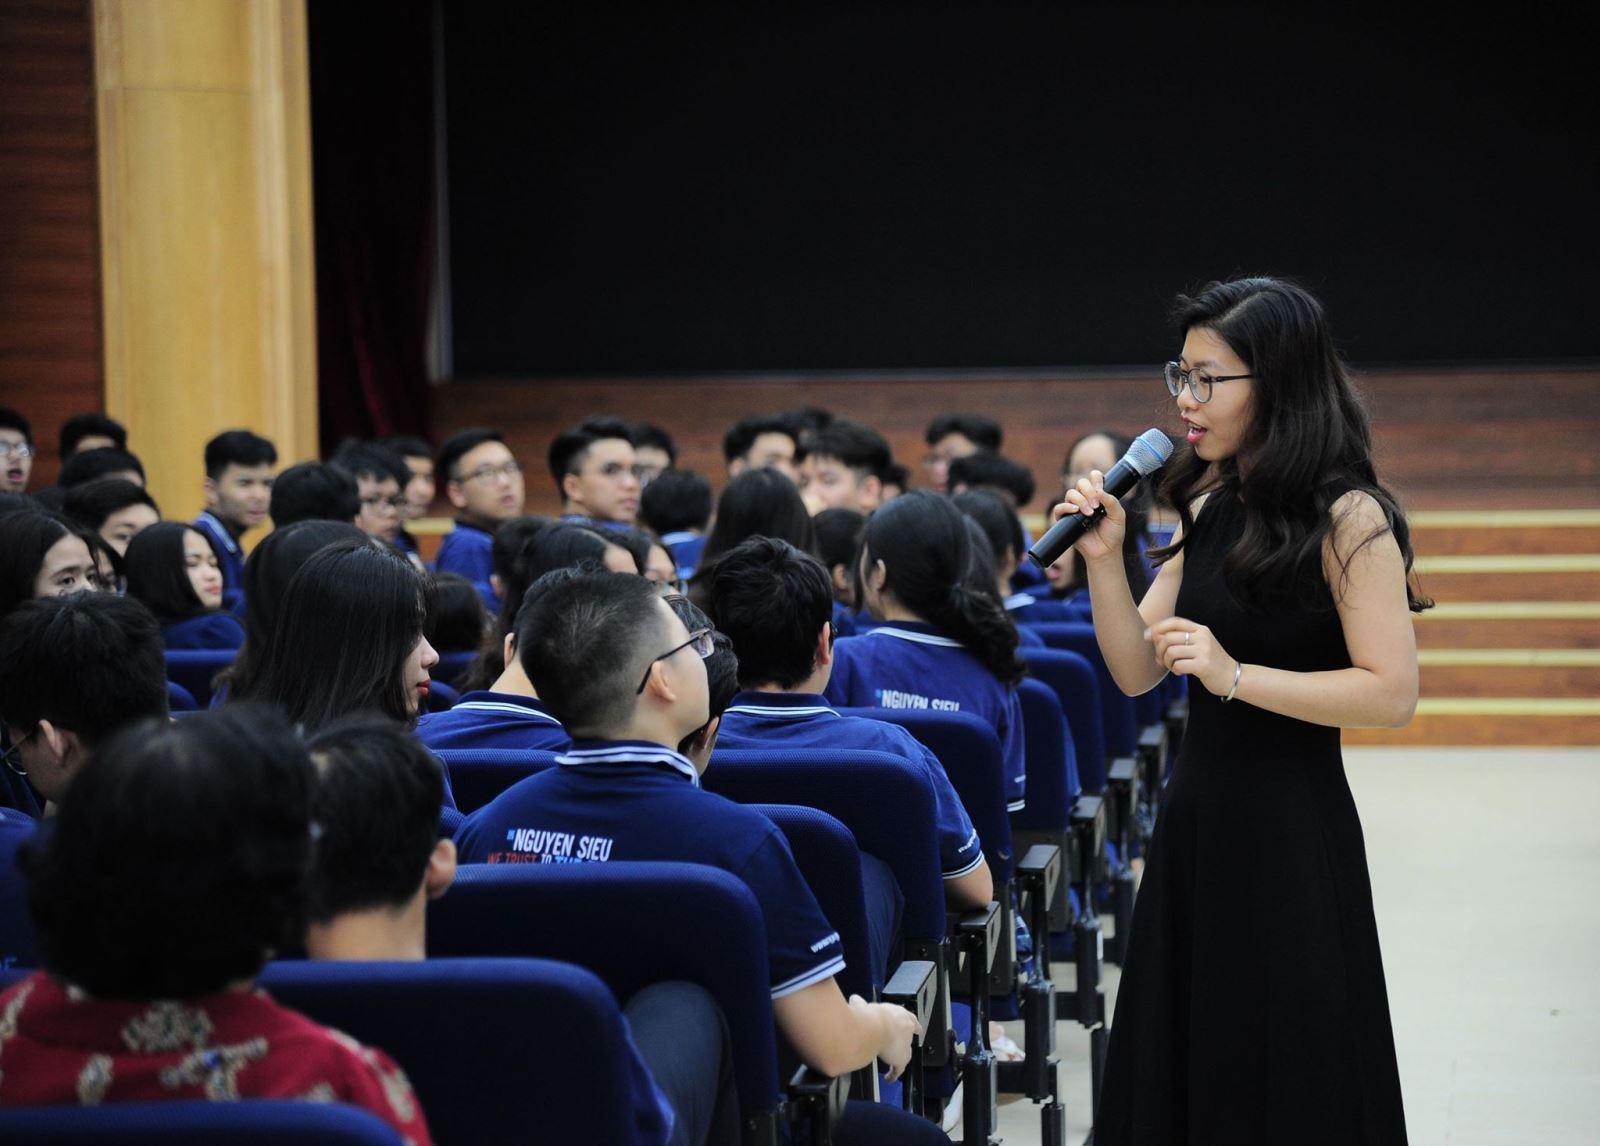 NEW ZEALAND EDUCATIONAL FAIR HOSTED BY NGUYEN SIEU SCHOOL